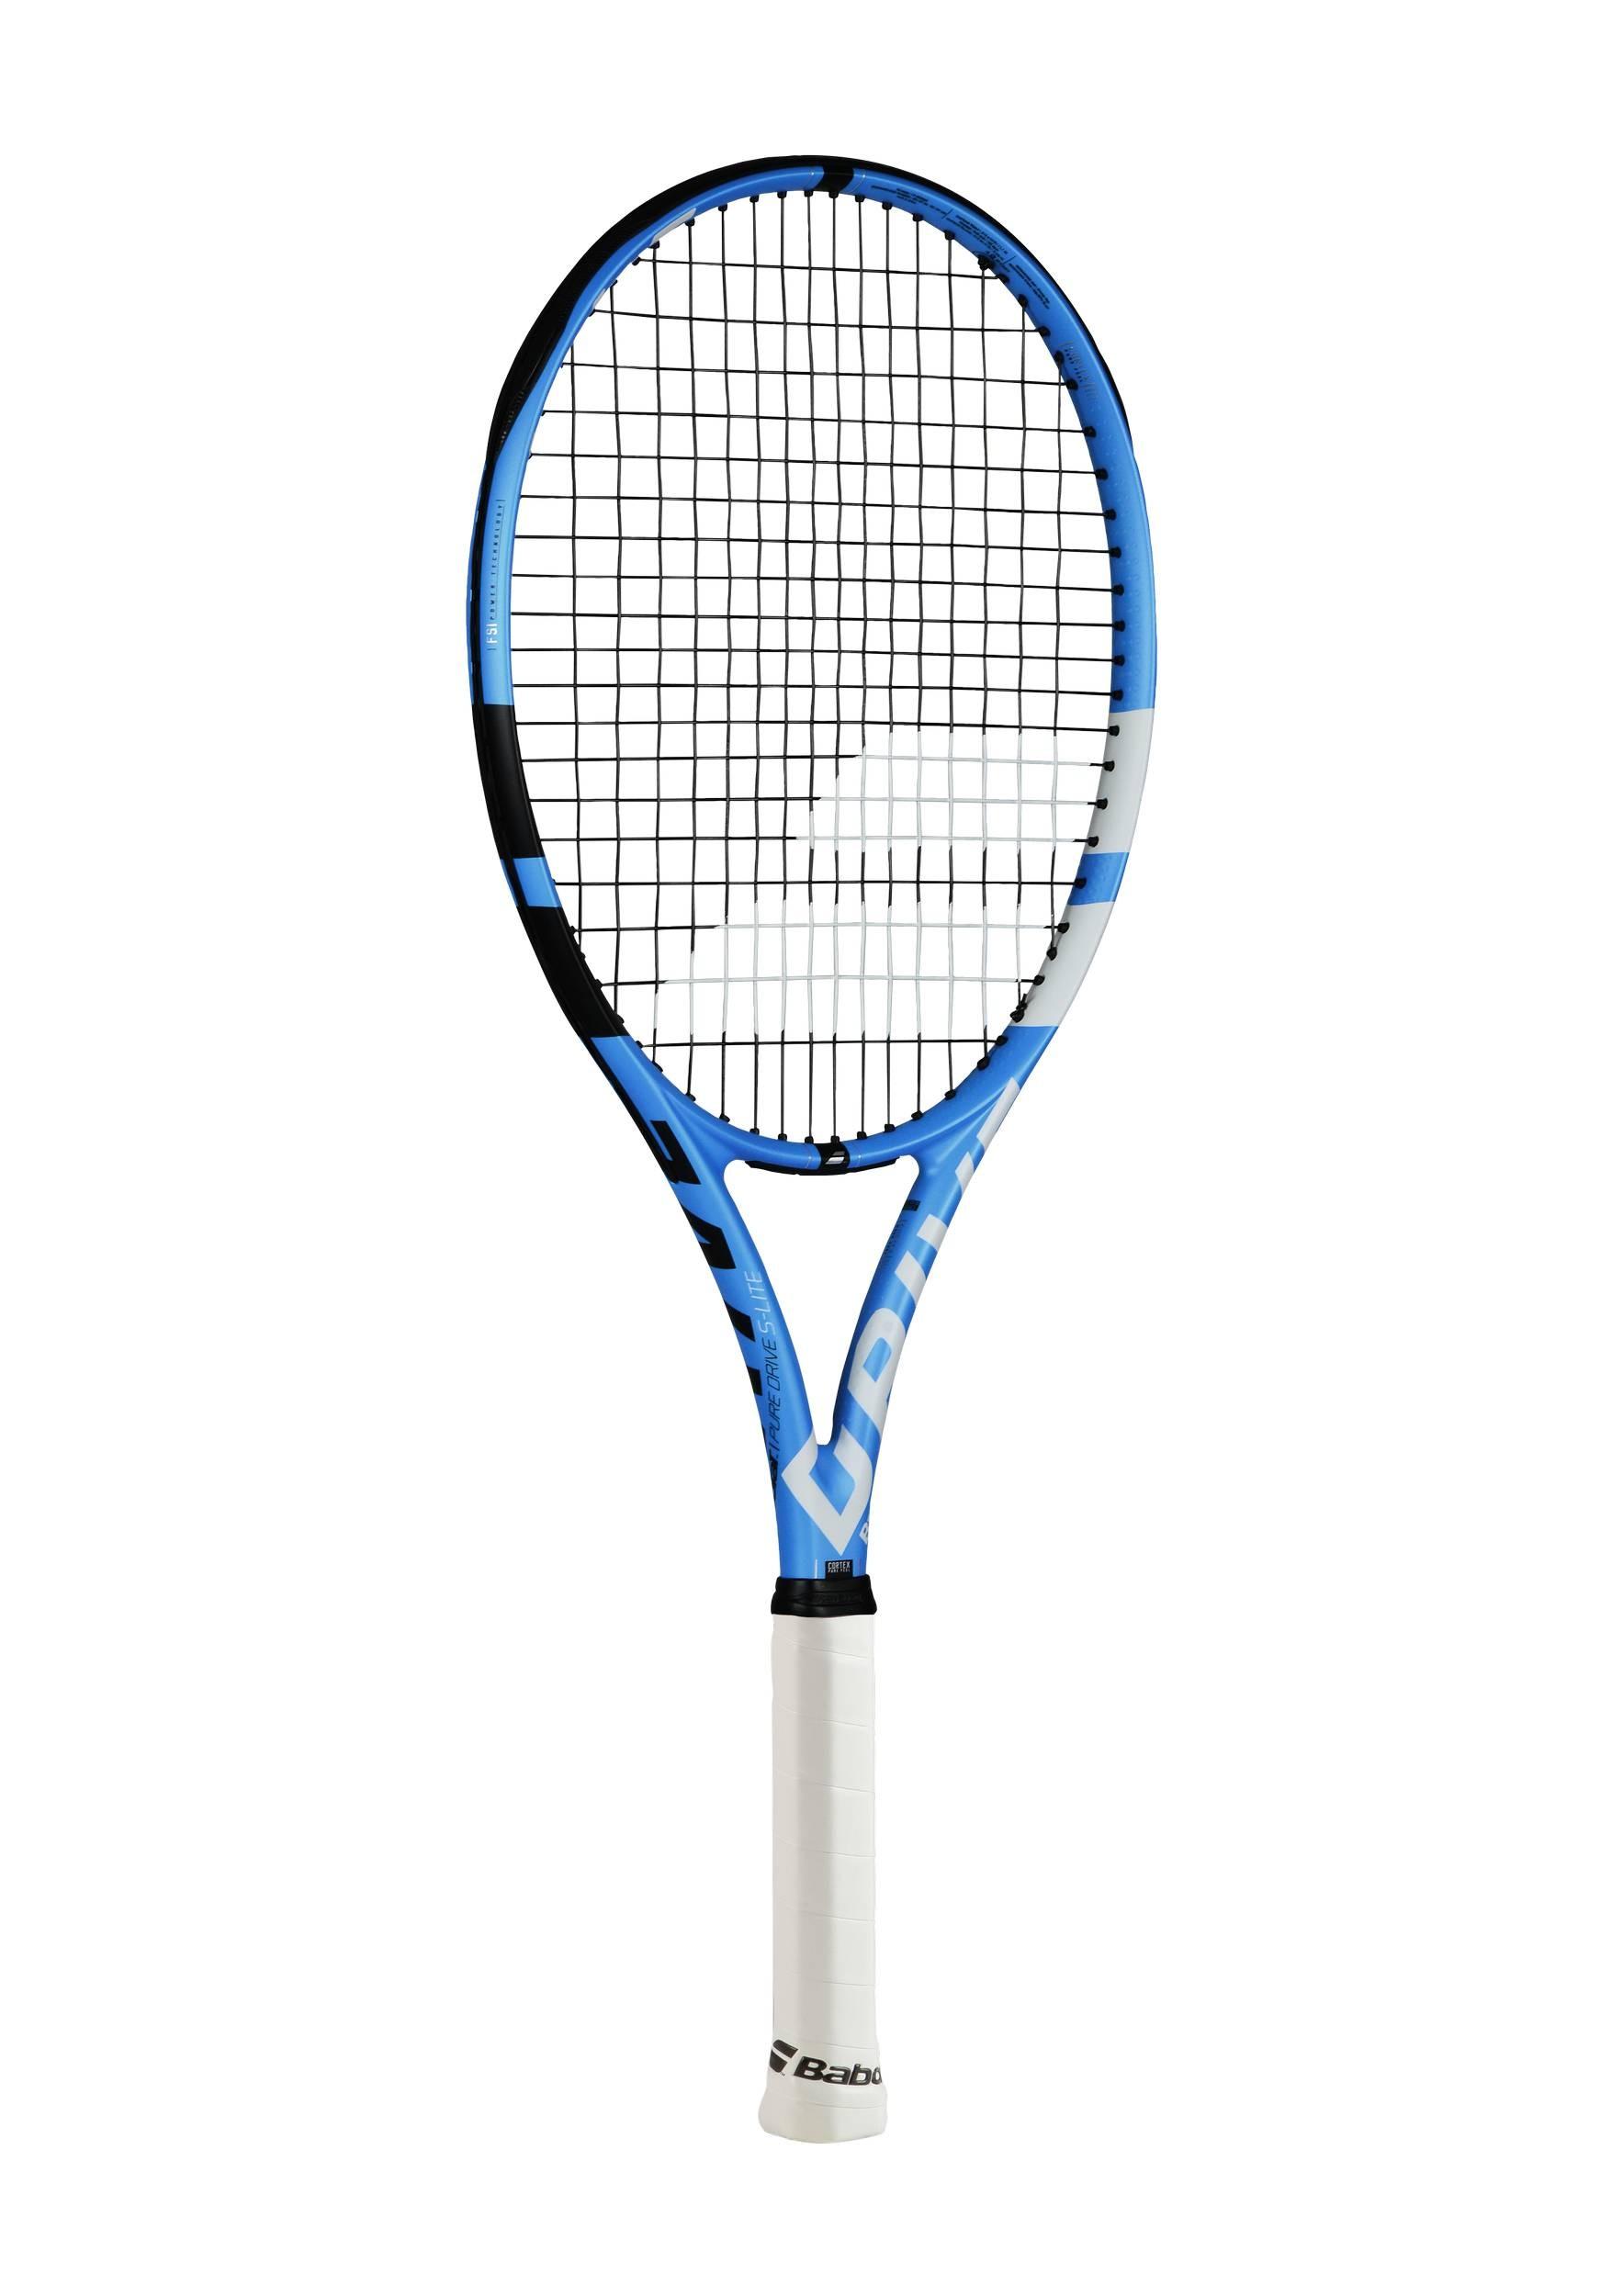 Rakieta tenisowa Babolat Pure Drive Super Lite 2018 + Spiraltek + VS Grip